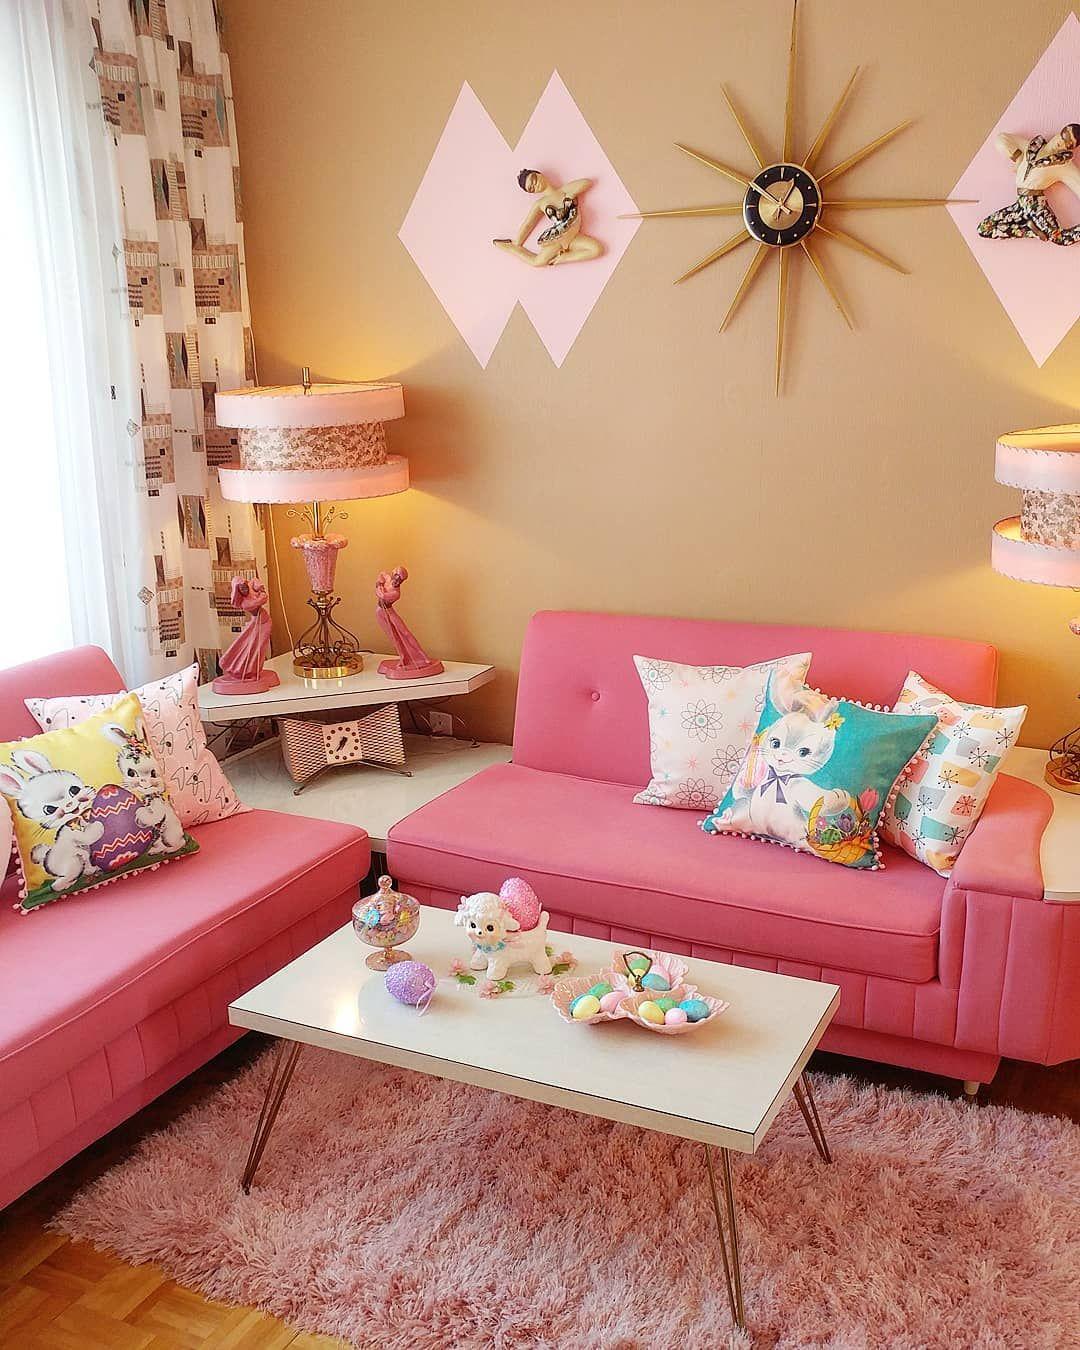 Image Via Jackieetjohn Instagram Retro Kitsch Pink Mcm Retro Home Decor Retro Home Retro Living Rooms